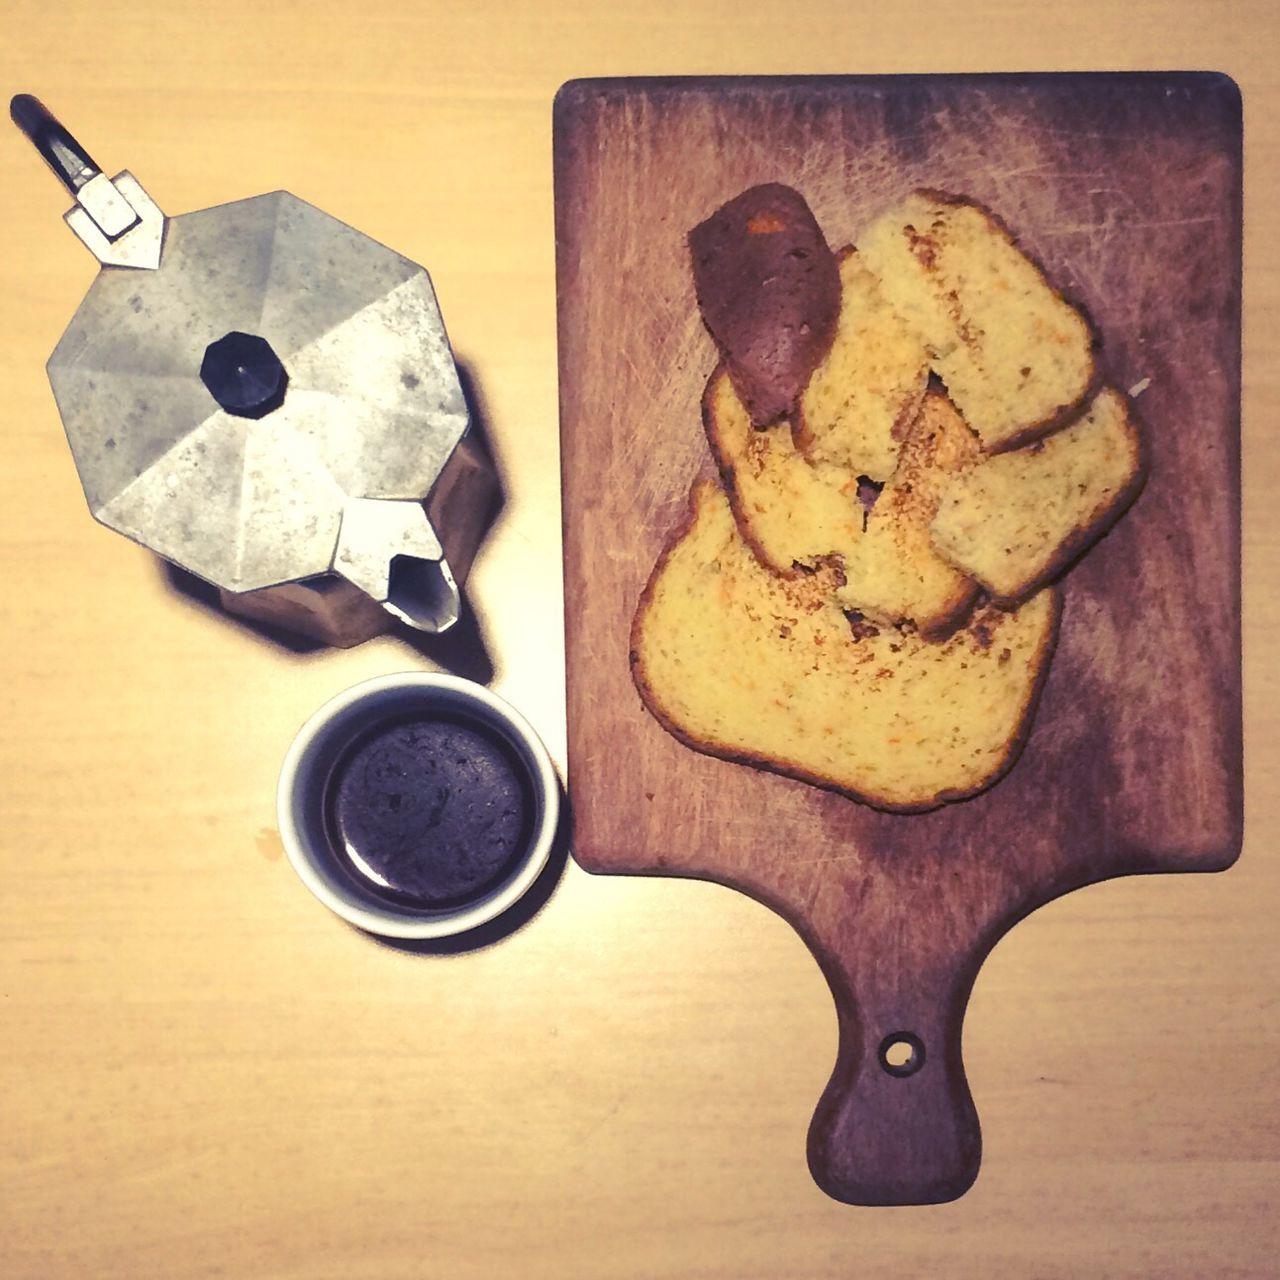 Coffee Food Food And Drink Bread Coffee - Drink Table Wood Breakfast Mocca